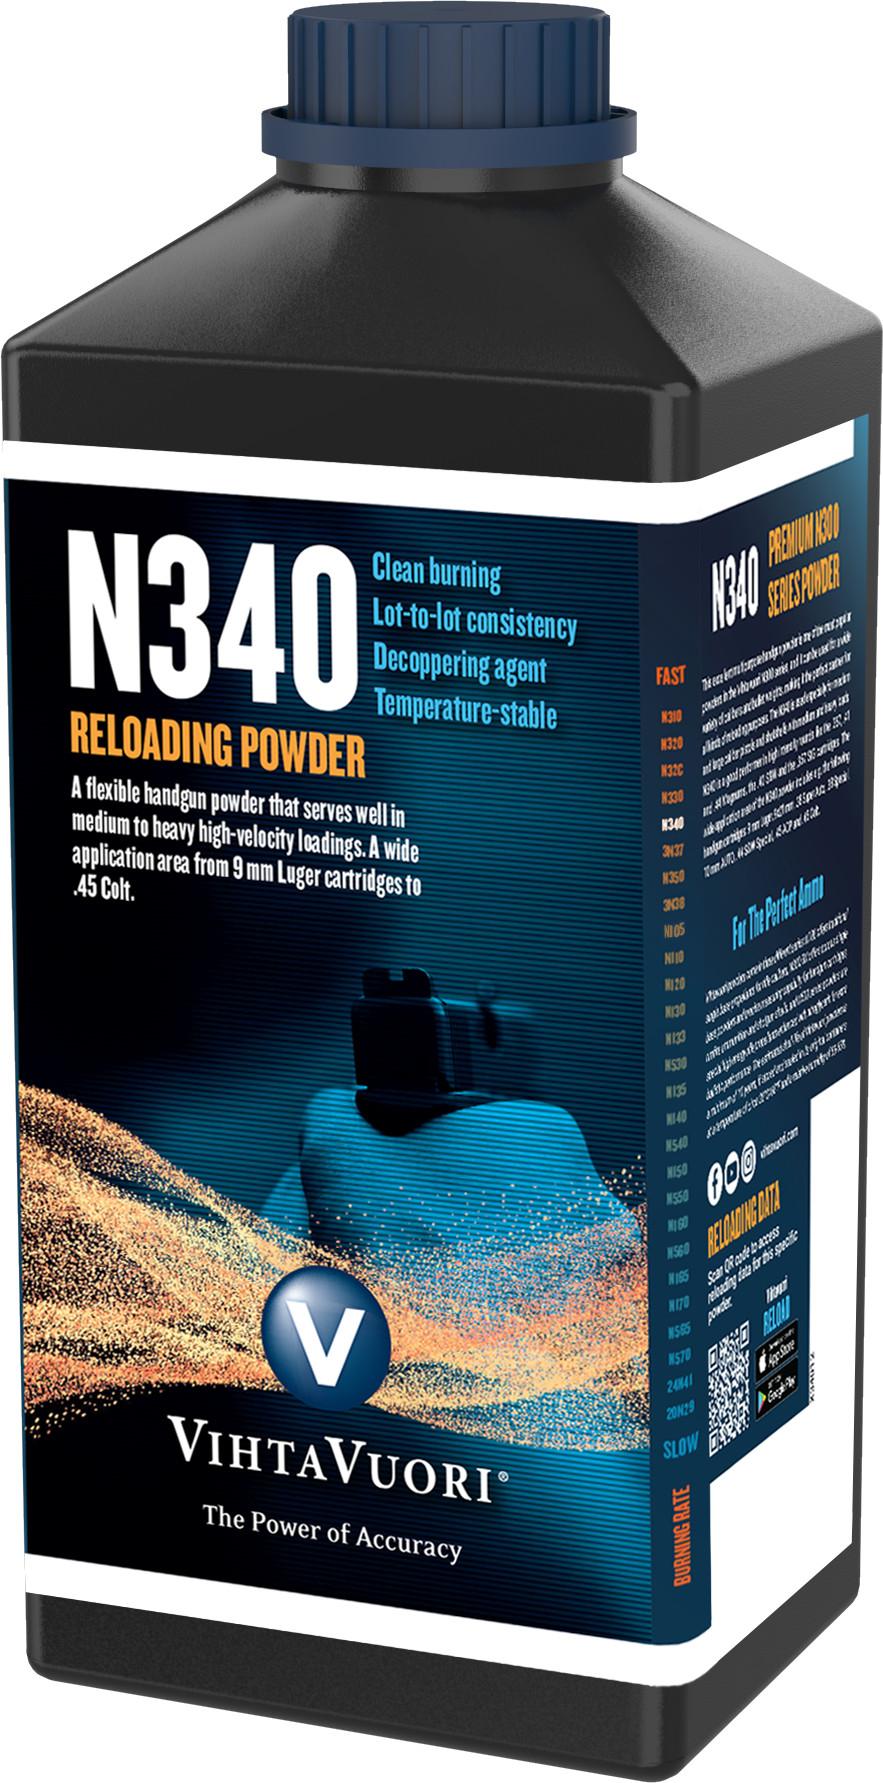 Vihtavuori N340 ruuti, 0,5 kg purkki